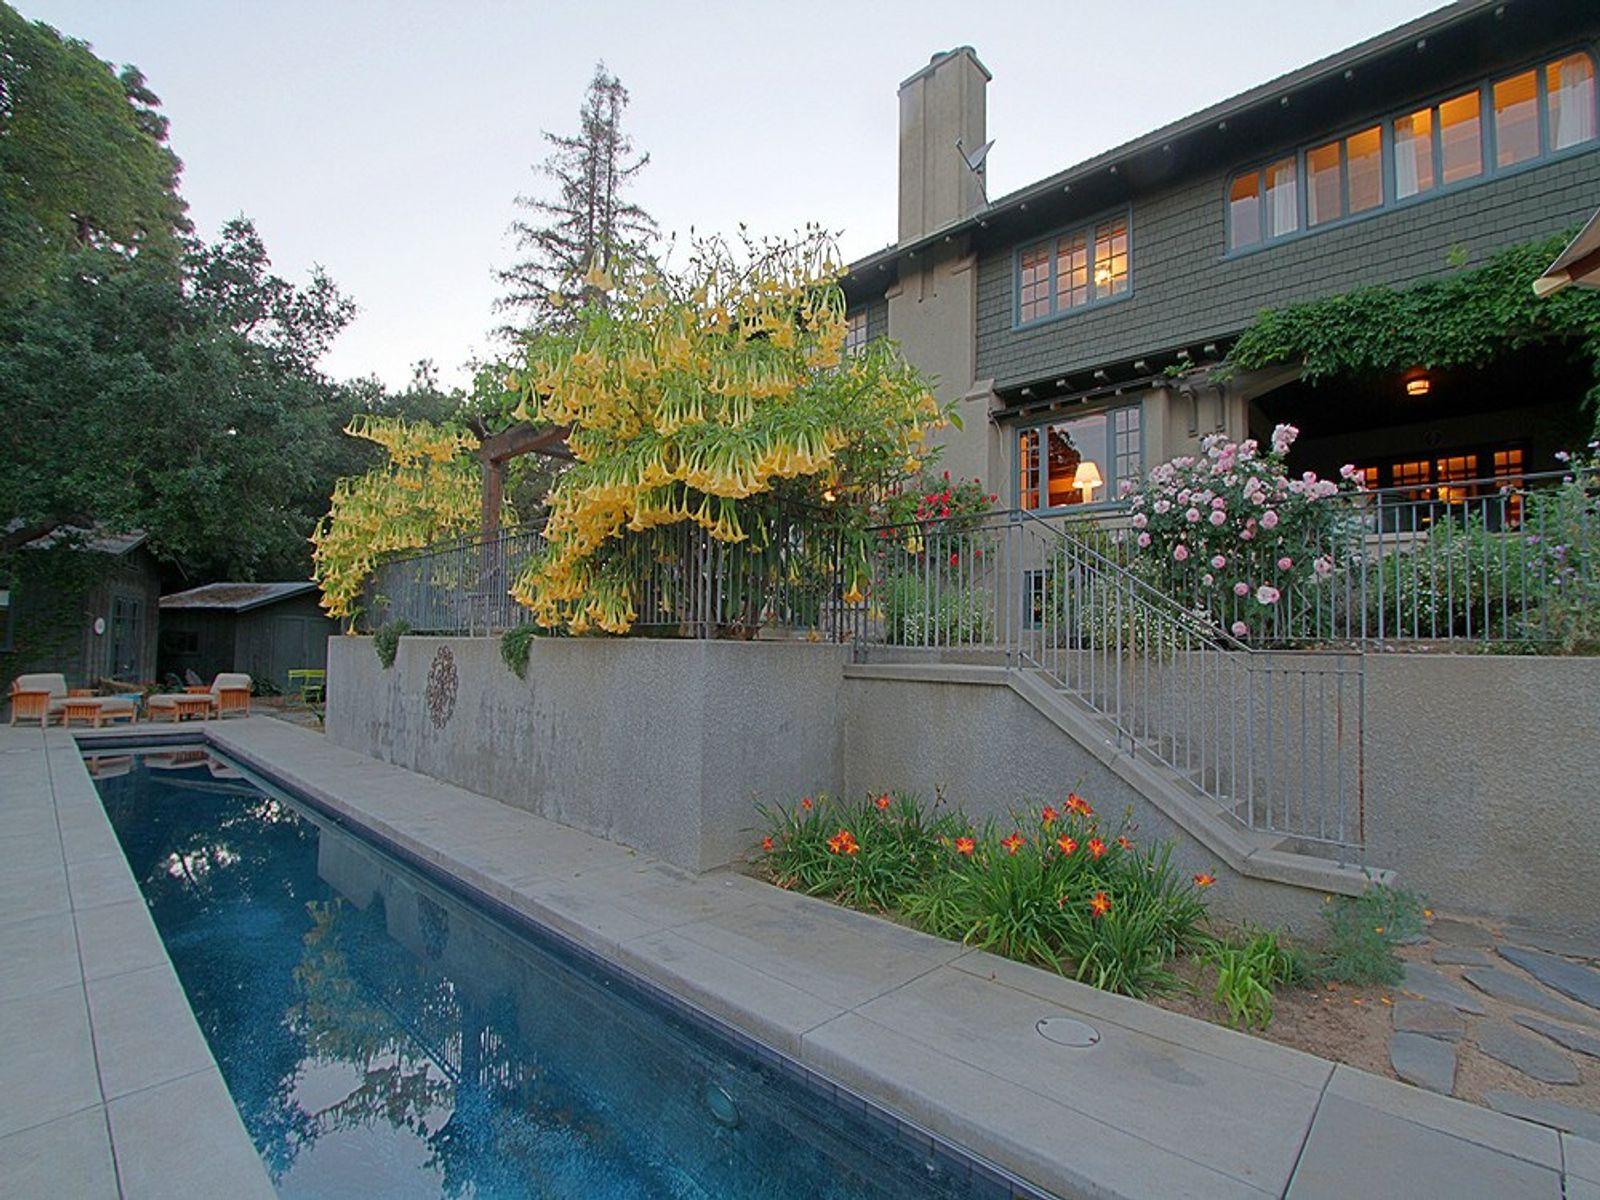 The Barnes House on Oak Ridge